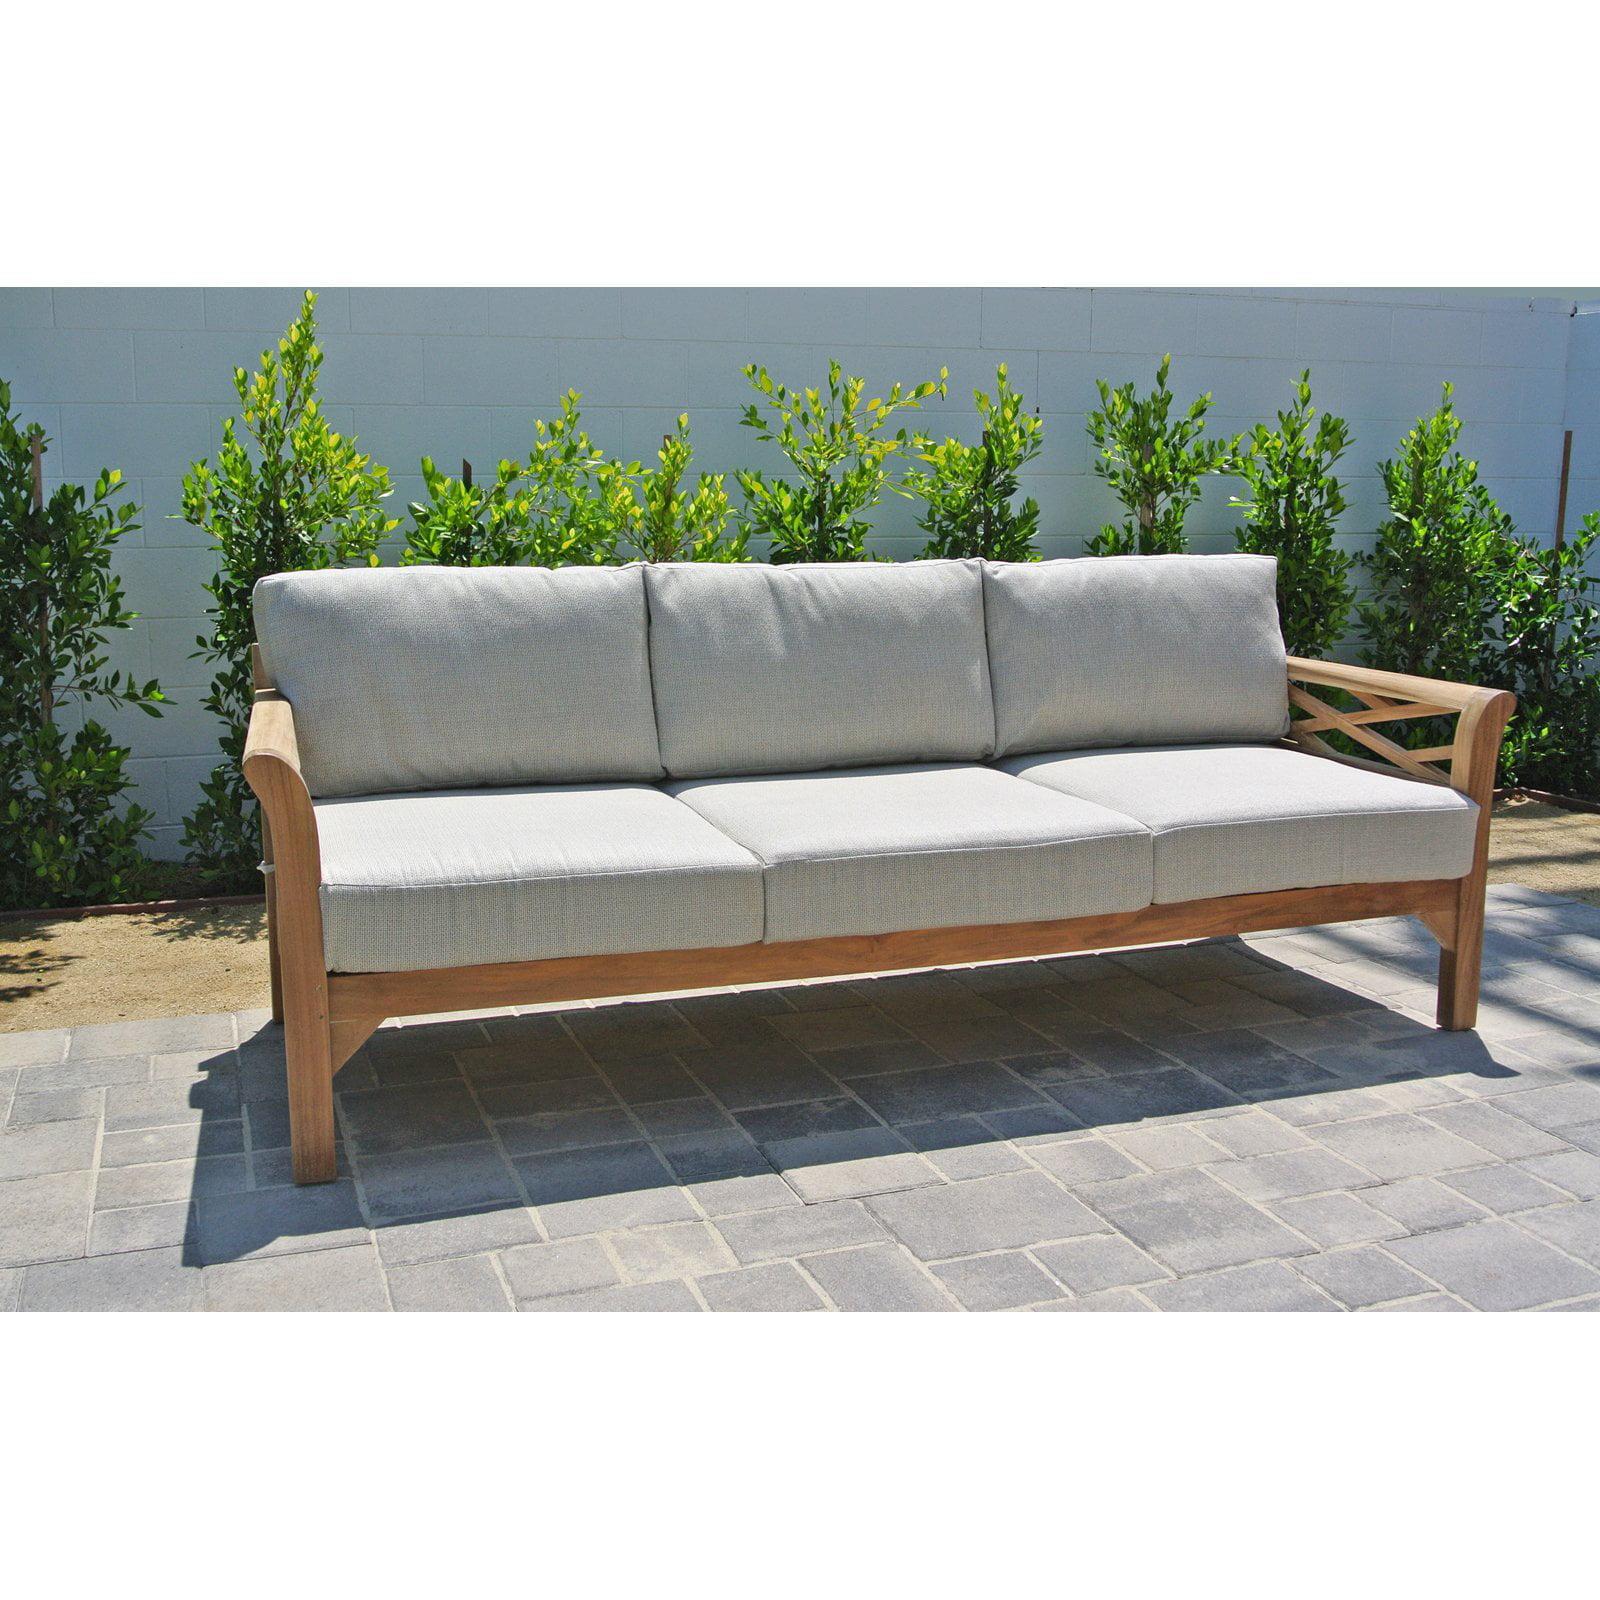 Willow Creek Designs Monterey Teak Sofa with Sunbrella Cushion